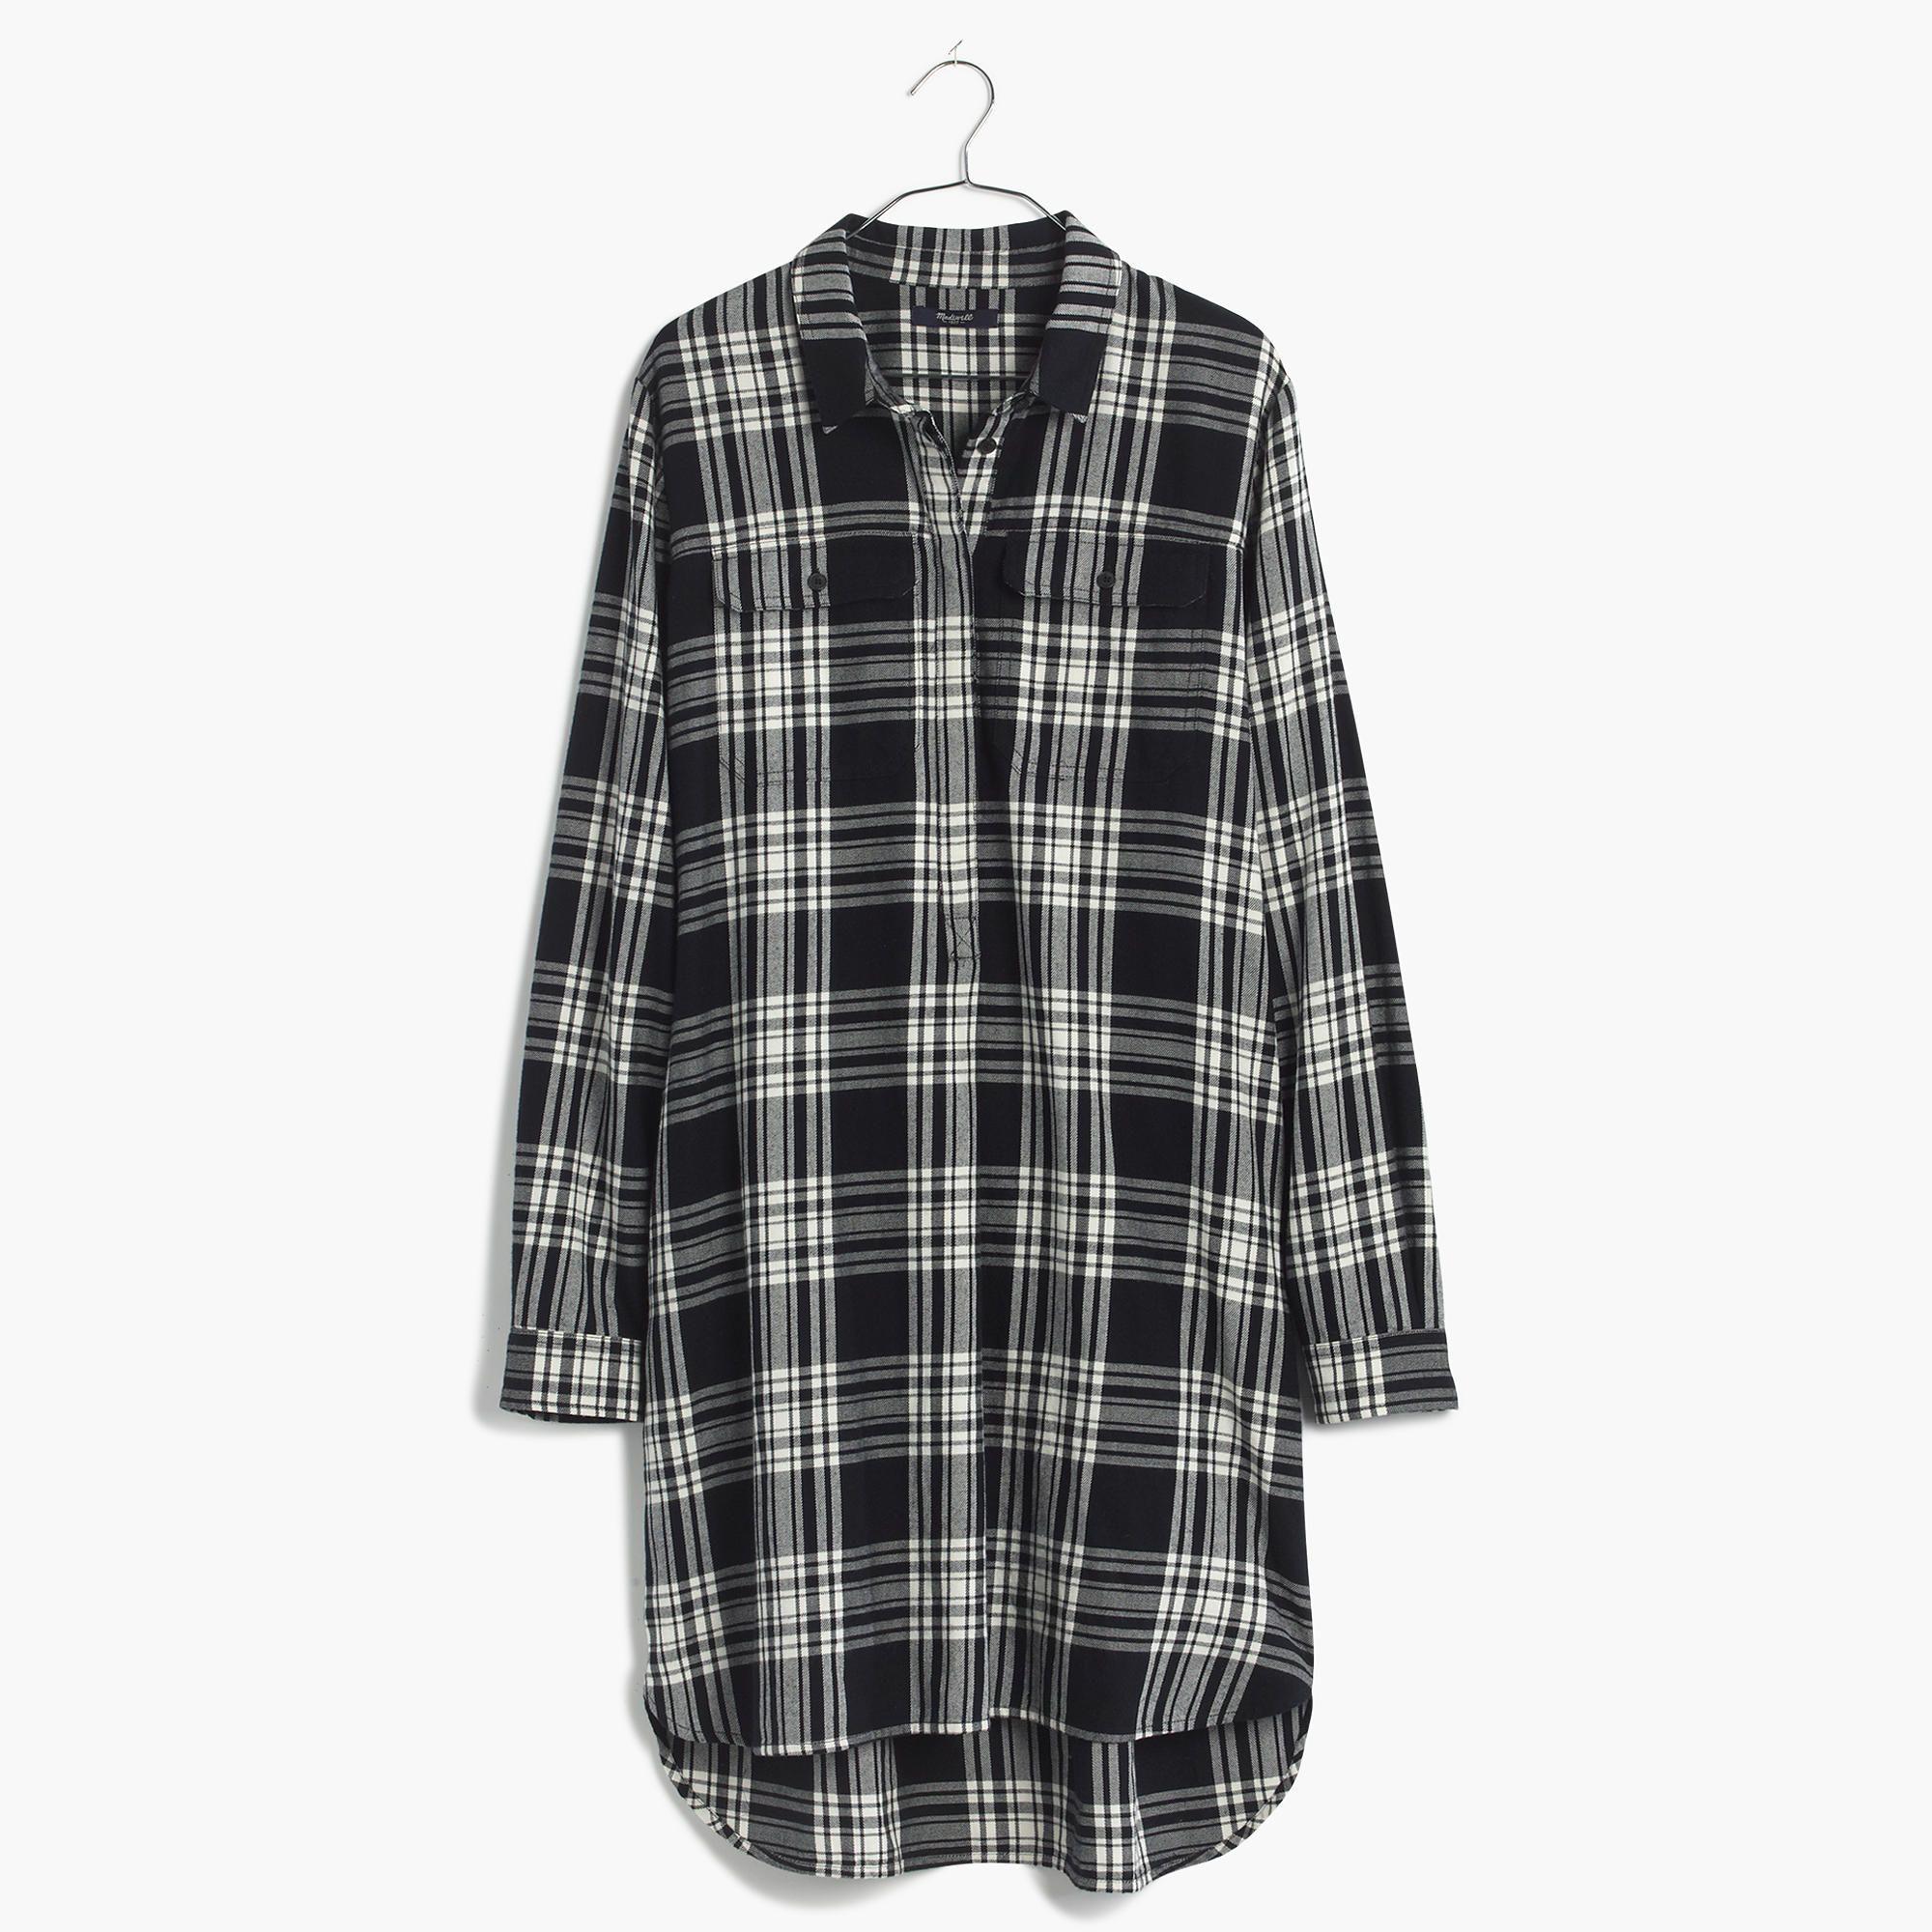 Flannel Daywalk Shirtdress In Glendale Plaid Flannel Shirt Dress Plaid Flannel Dress Tartan Plaid Dress [ 2000 x 2000 Pixel ]